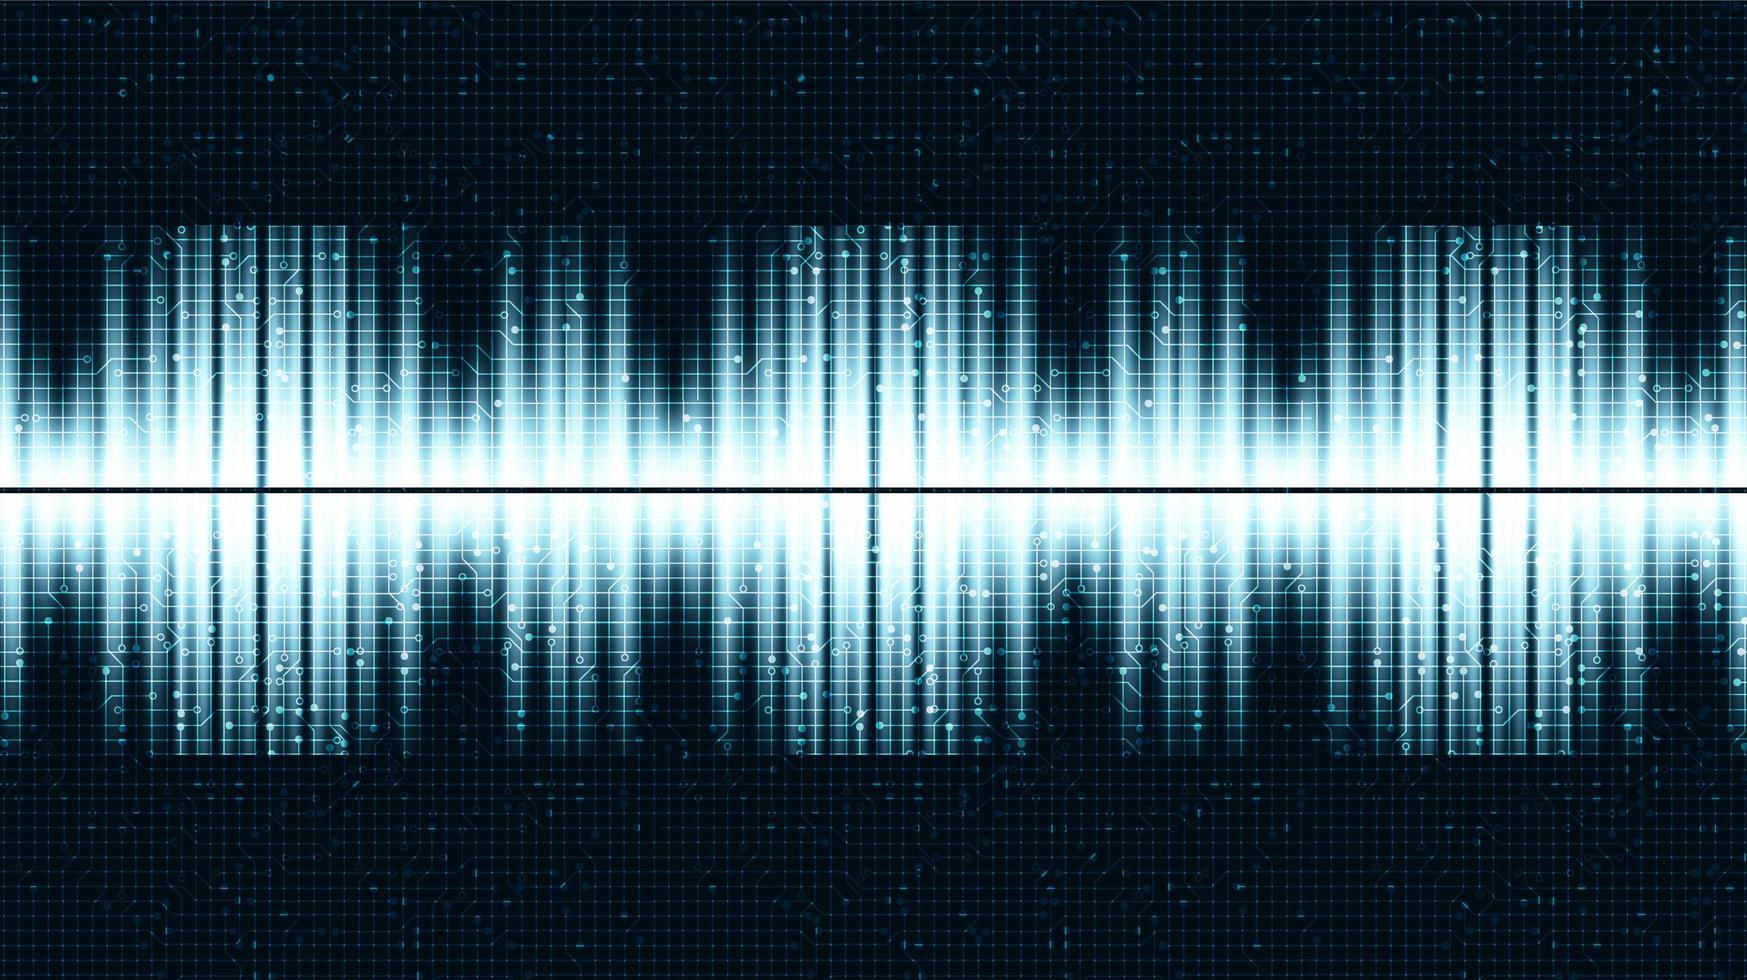 ultrasone geluidsgolf achtergrond vector